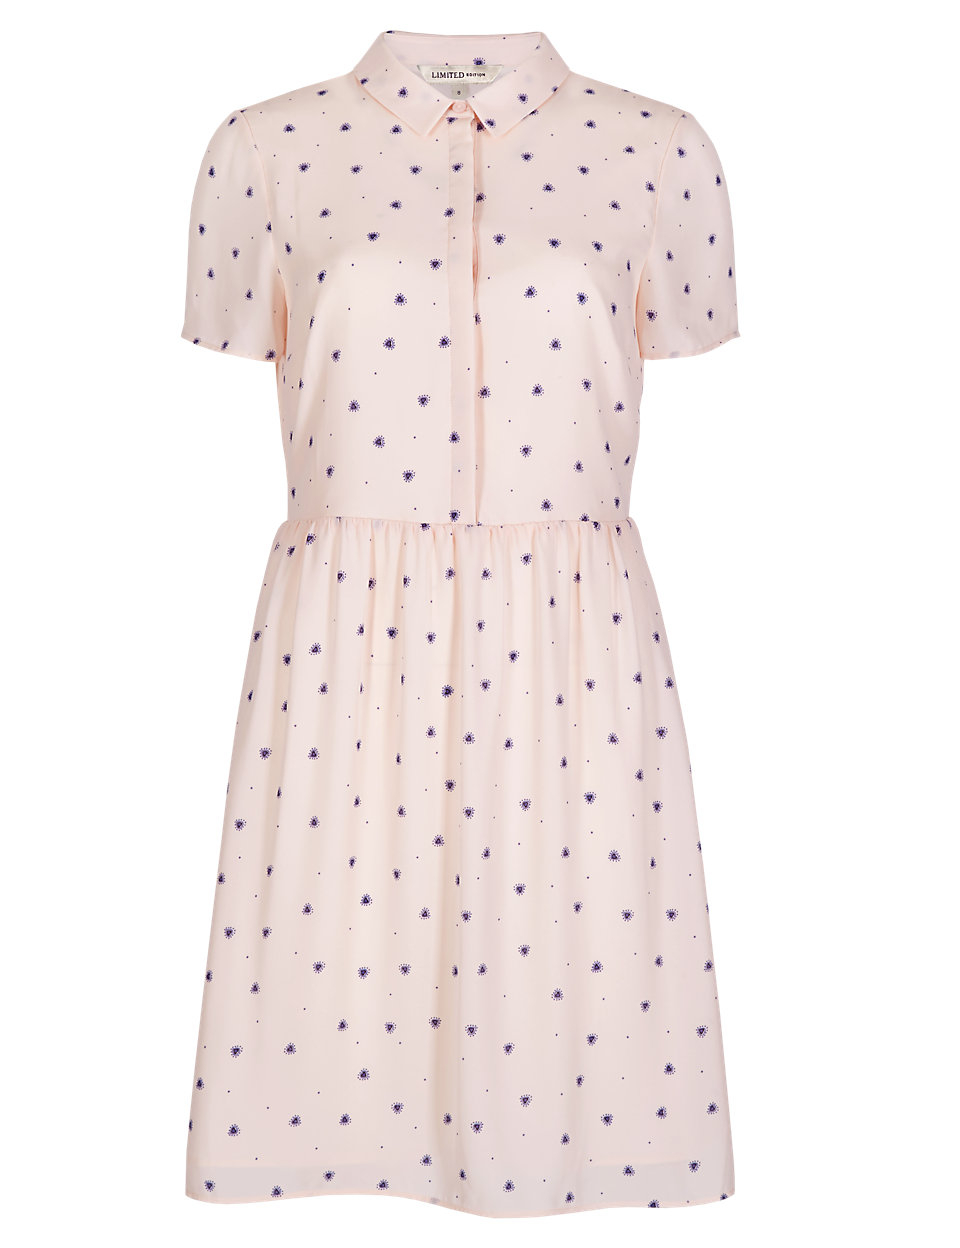 No Peep™ Heart Print Shift Dress £45